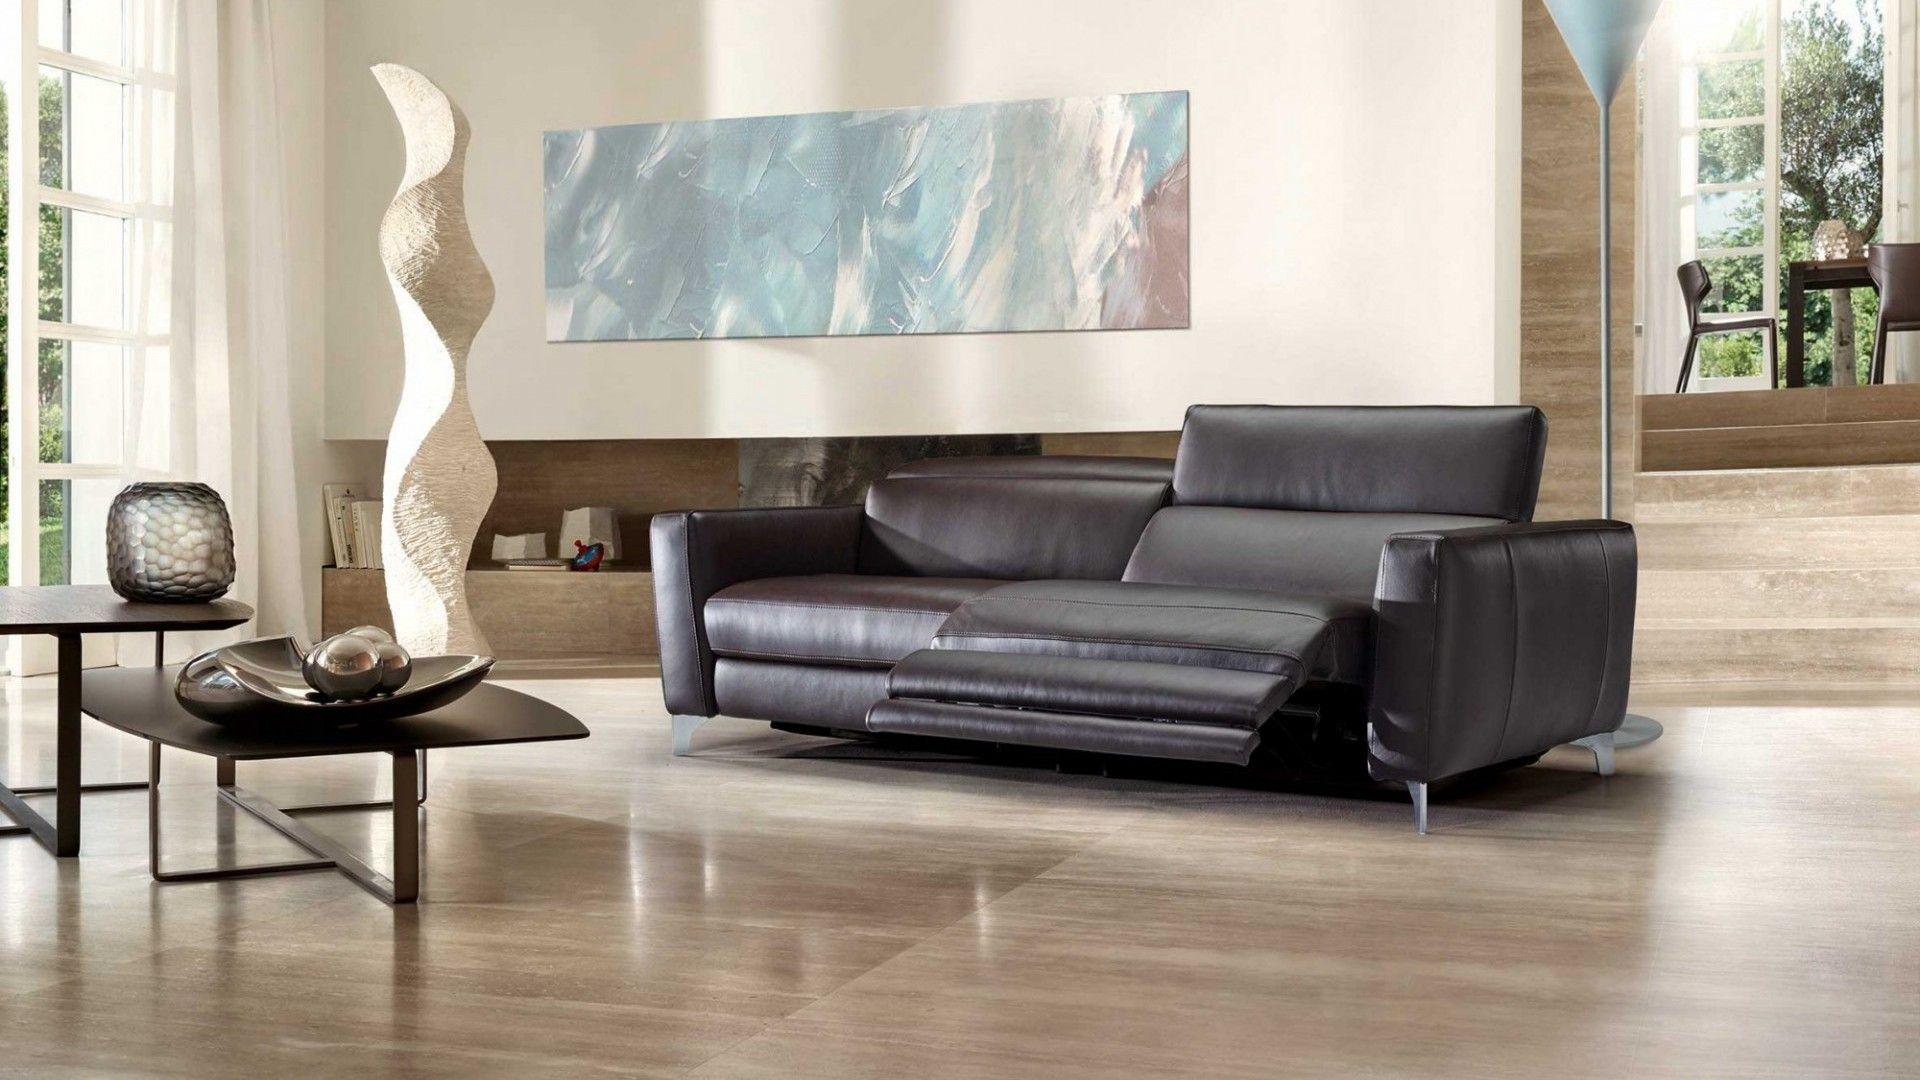 Natuzzi italia volo sofa natuzzi italia philadelphia for Furniture r us philadelphia